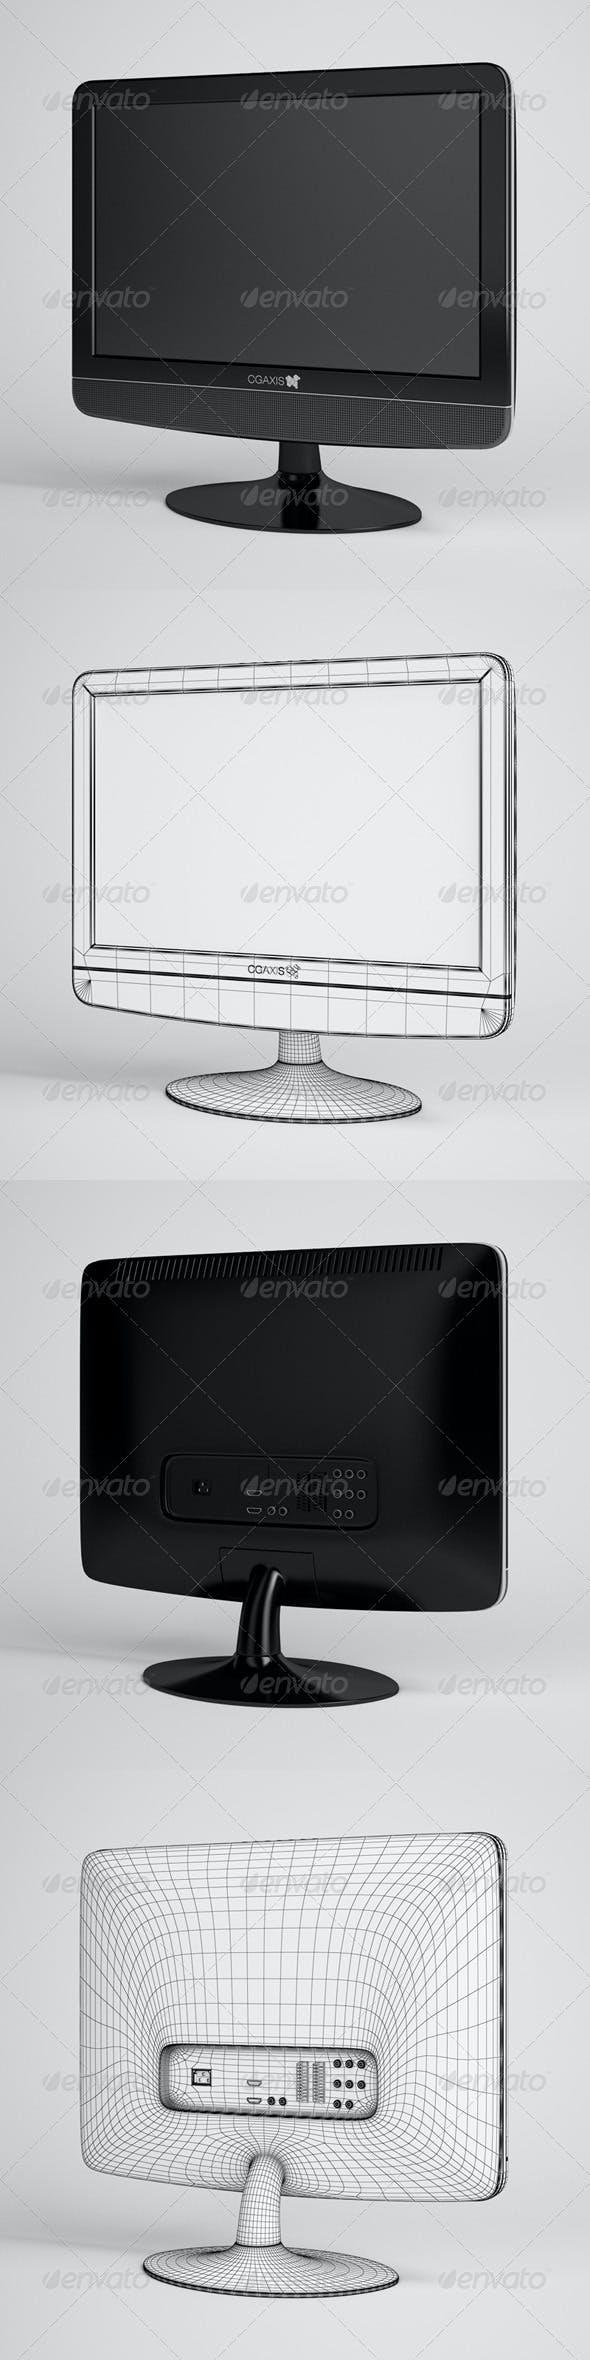 CGAxis Flatscreen TV Electronics 05 - 3DOcean Item for Sale